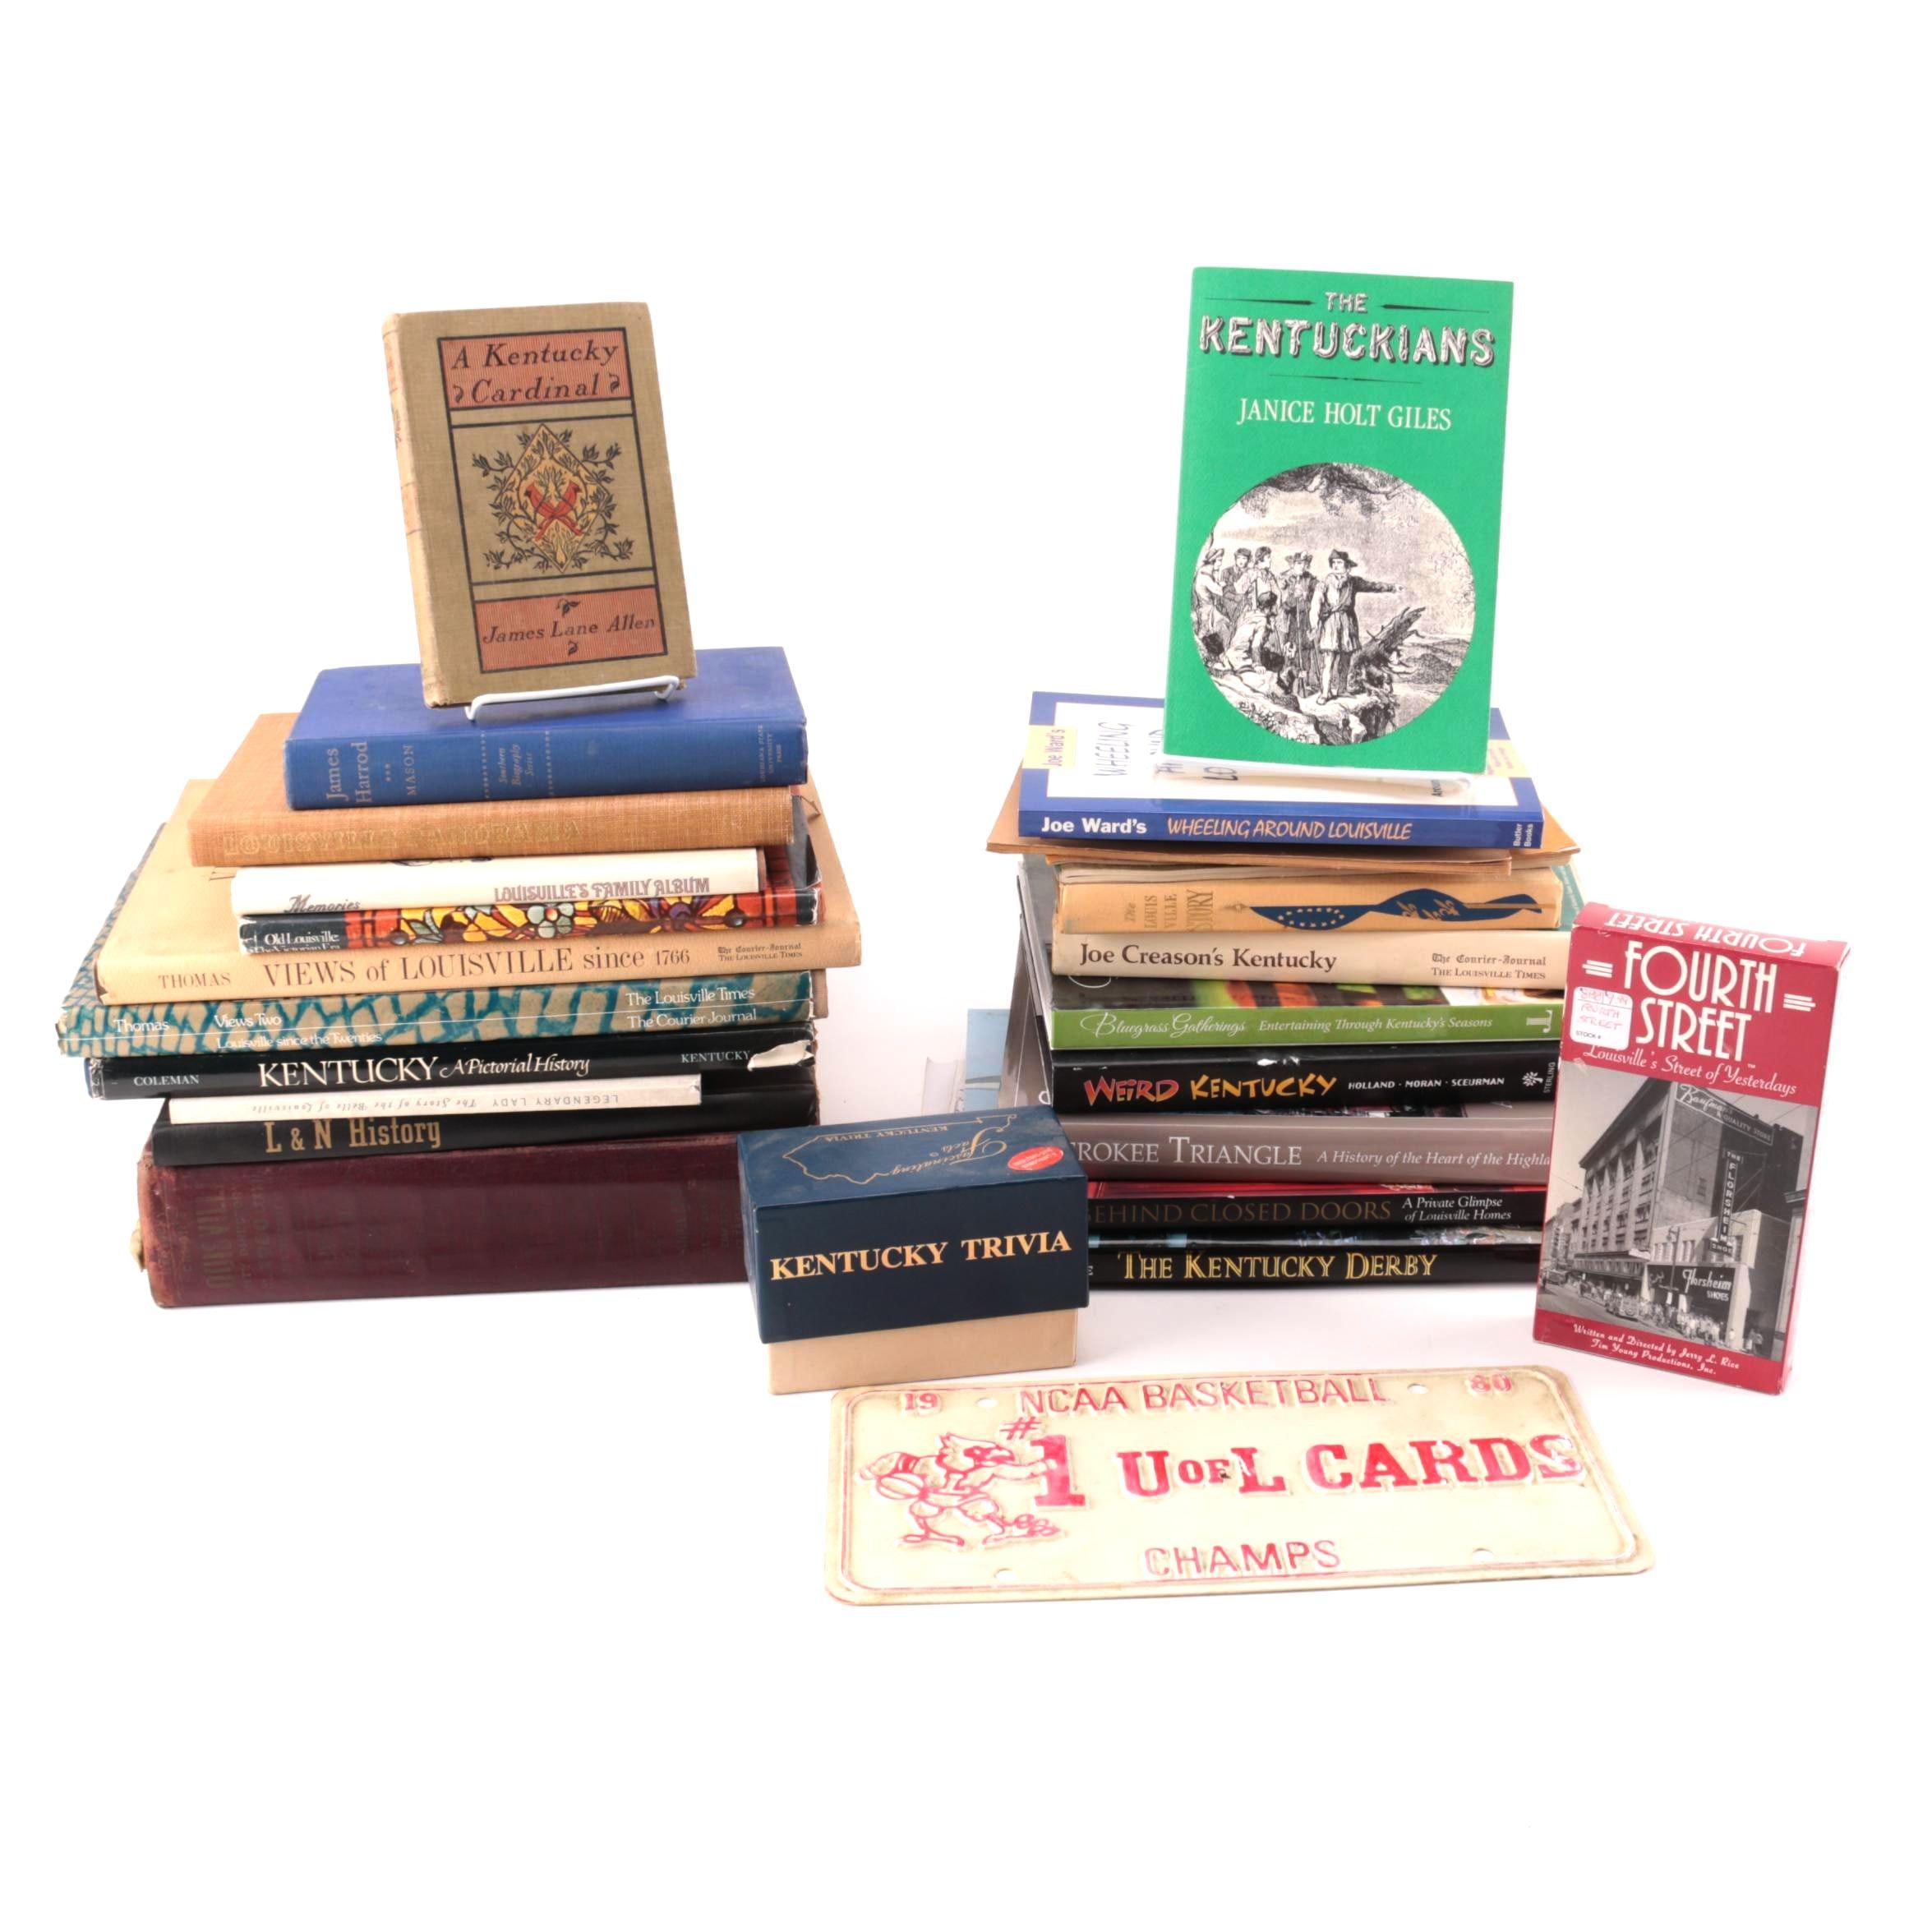 Books, Ephemera and Memorabilia on Kentucky